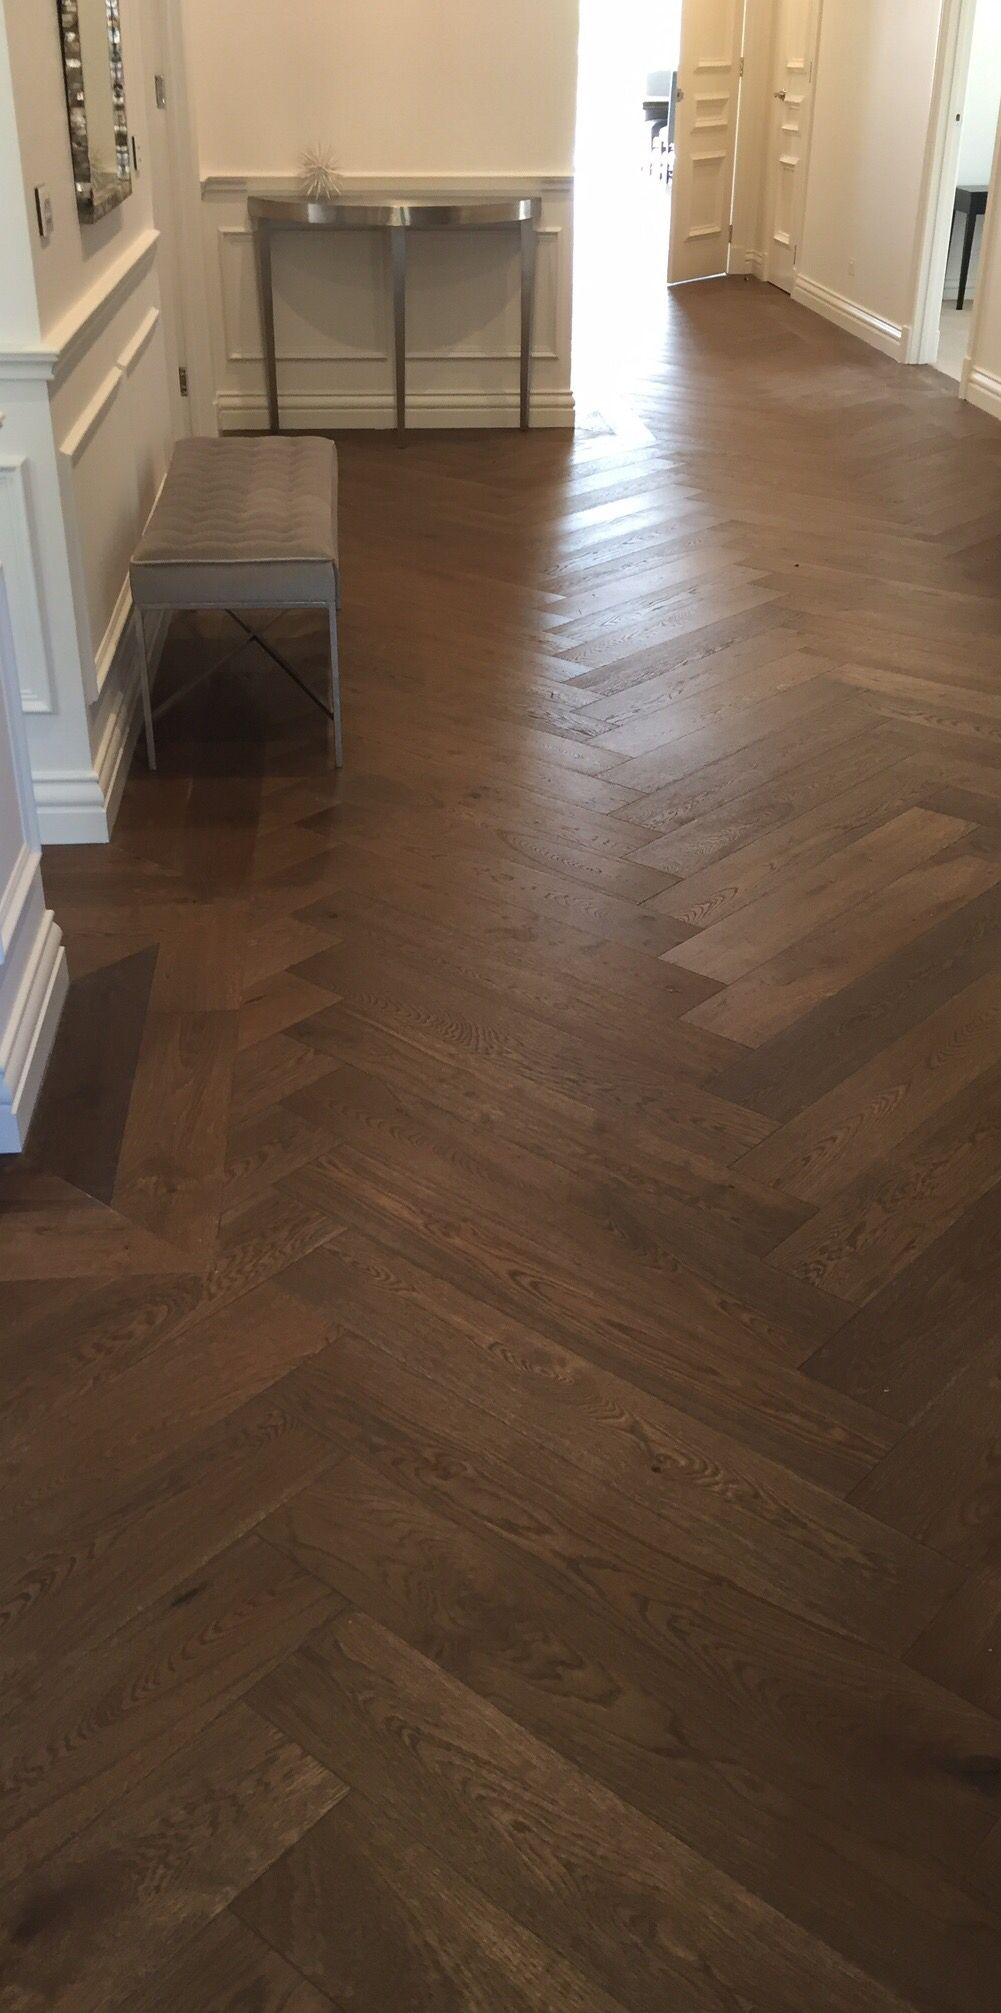 Paper bag floor youtube - Interior Timber Floors Smoked Oak Floor Boards Herringbone Style